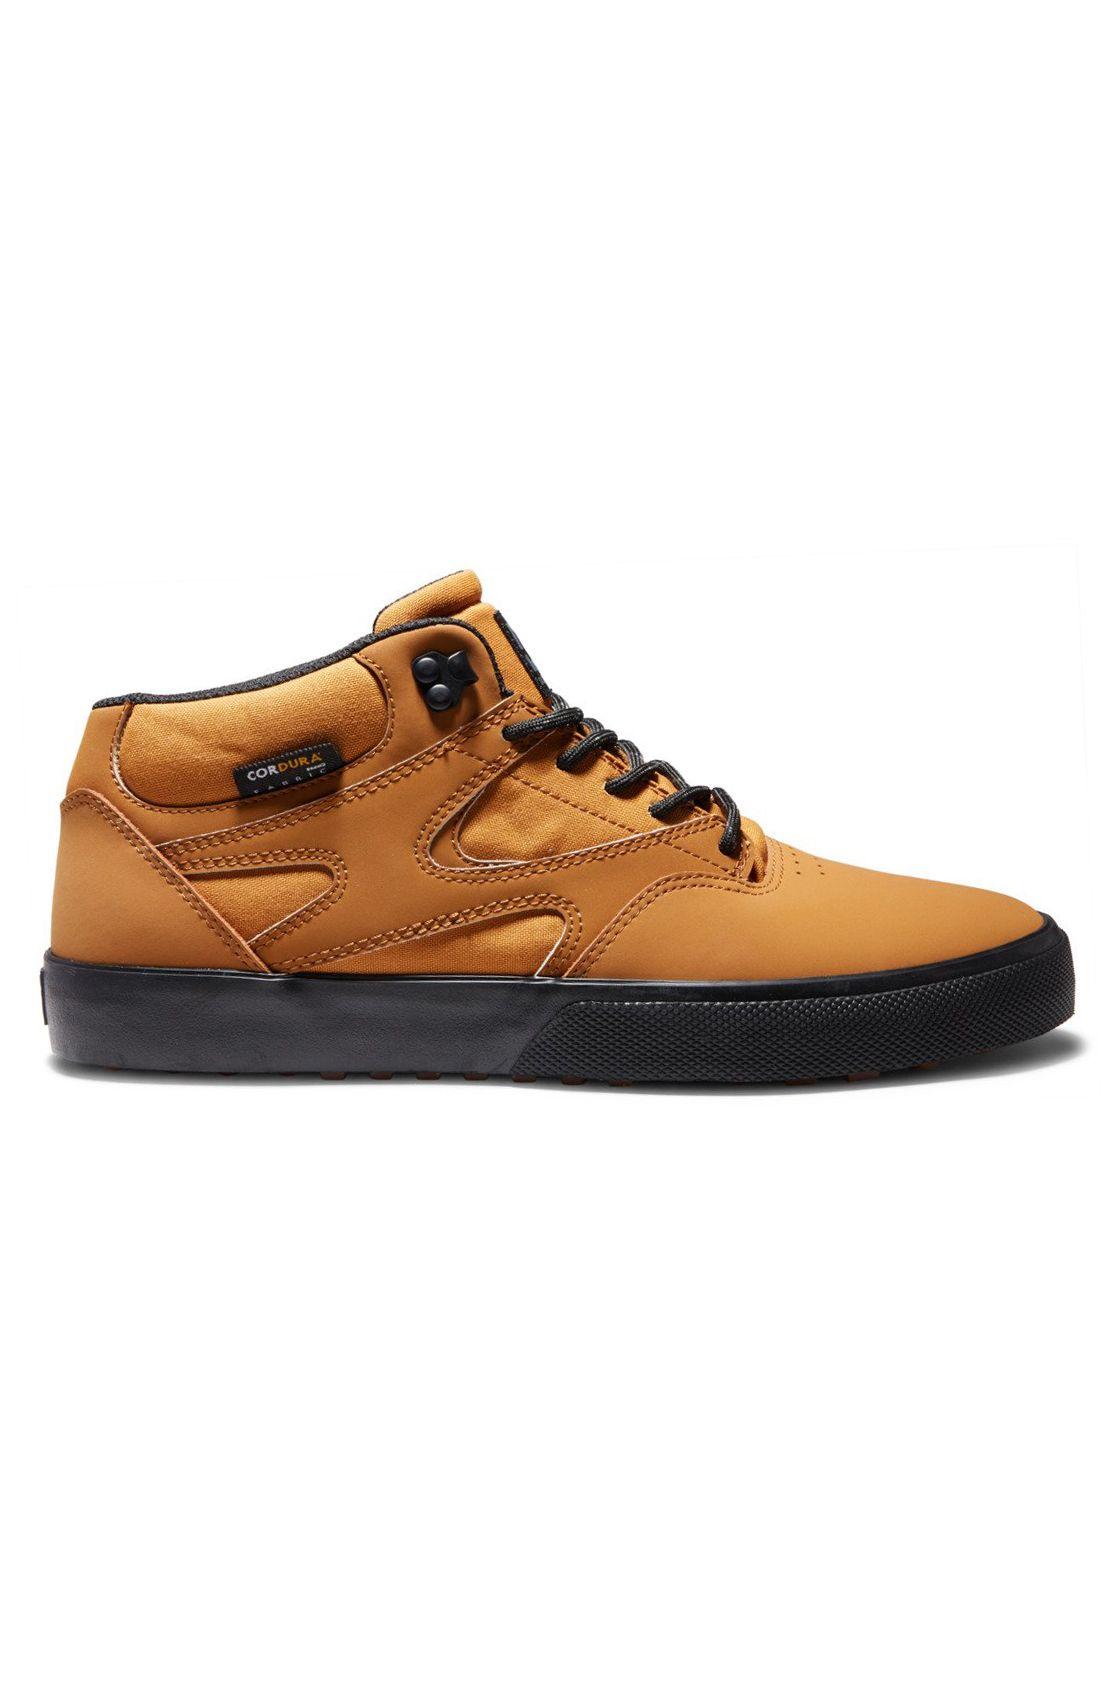 DC Shoes Shoes KALIS VULC MID WNT Wheat/Black